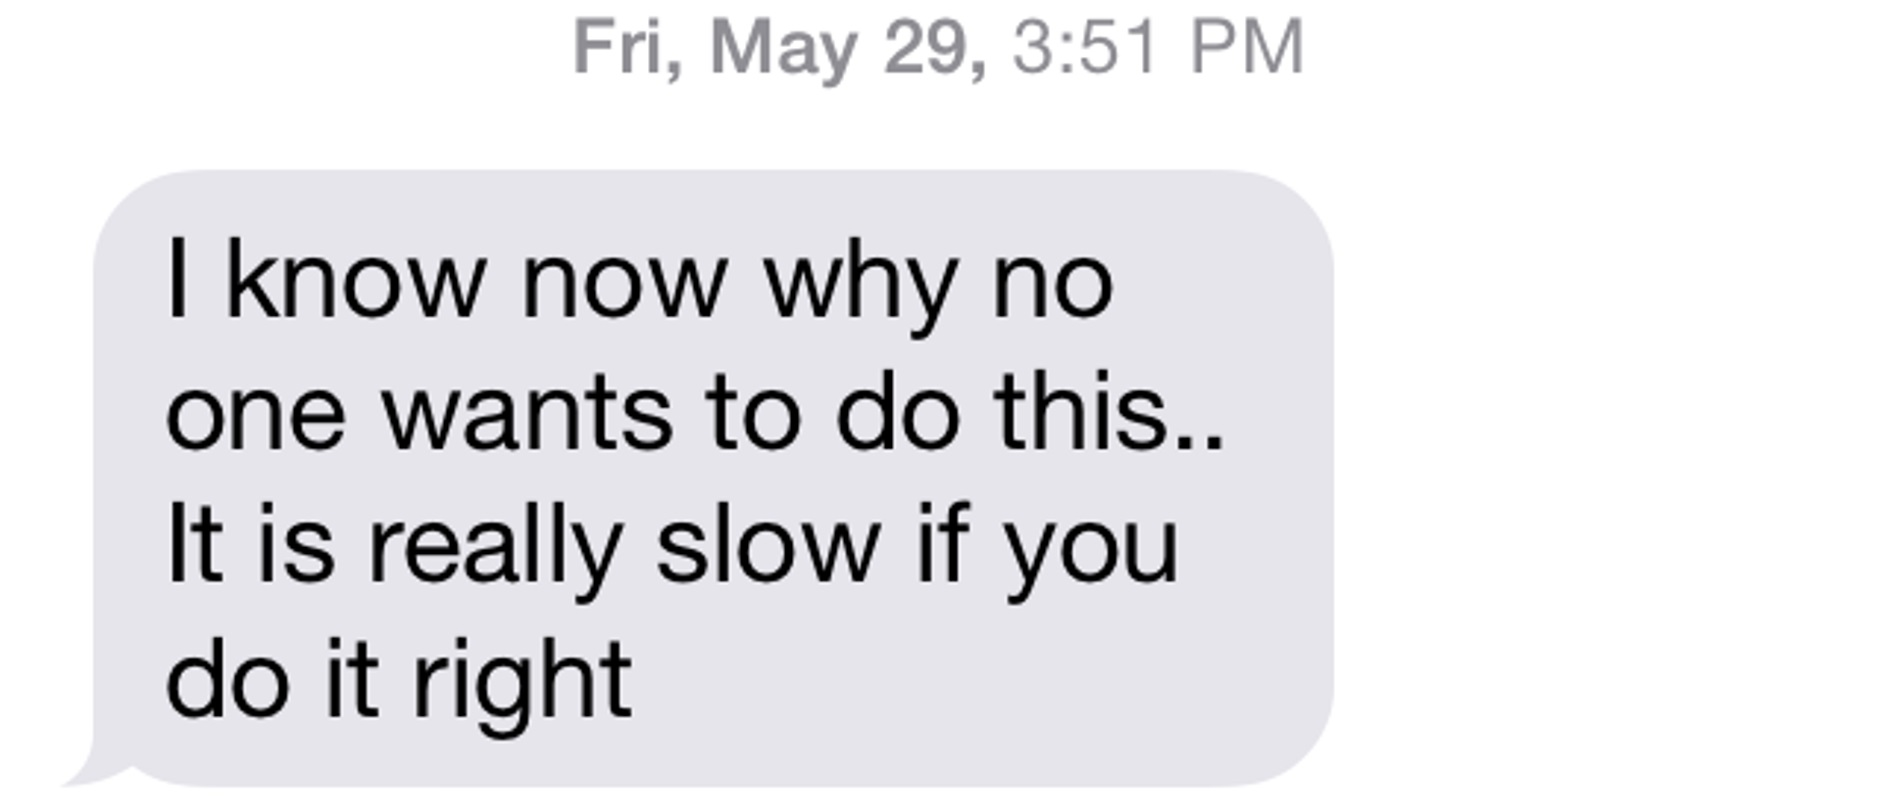 Ray's Text